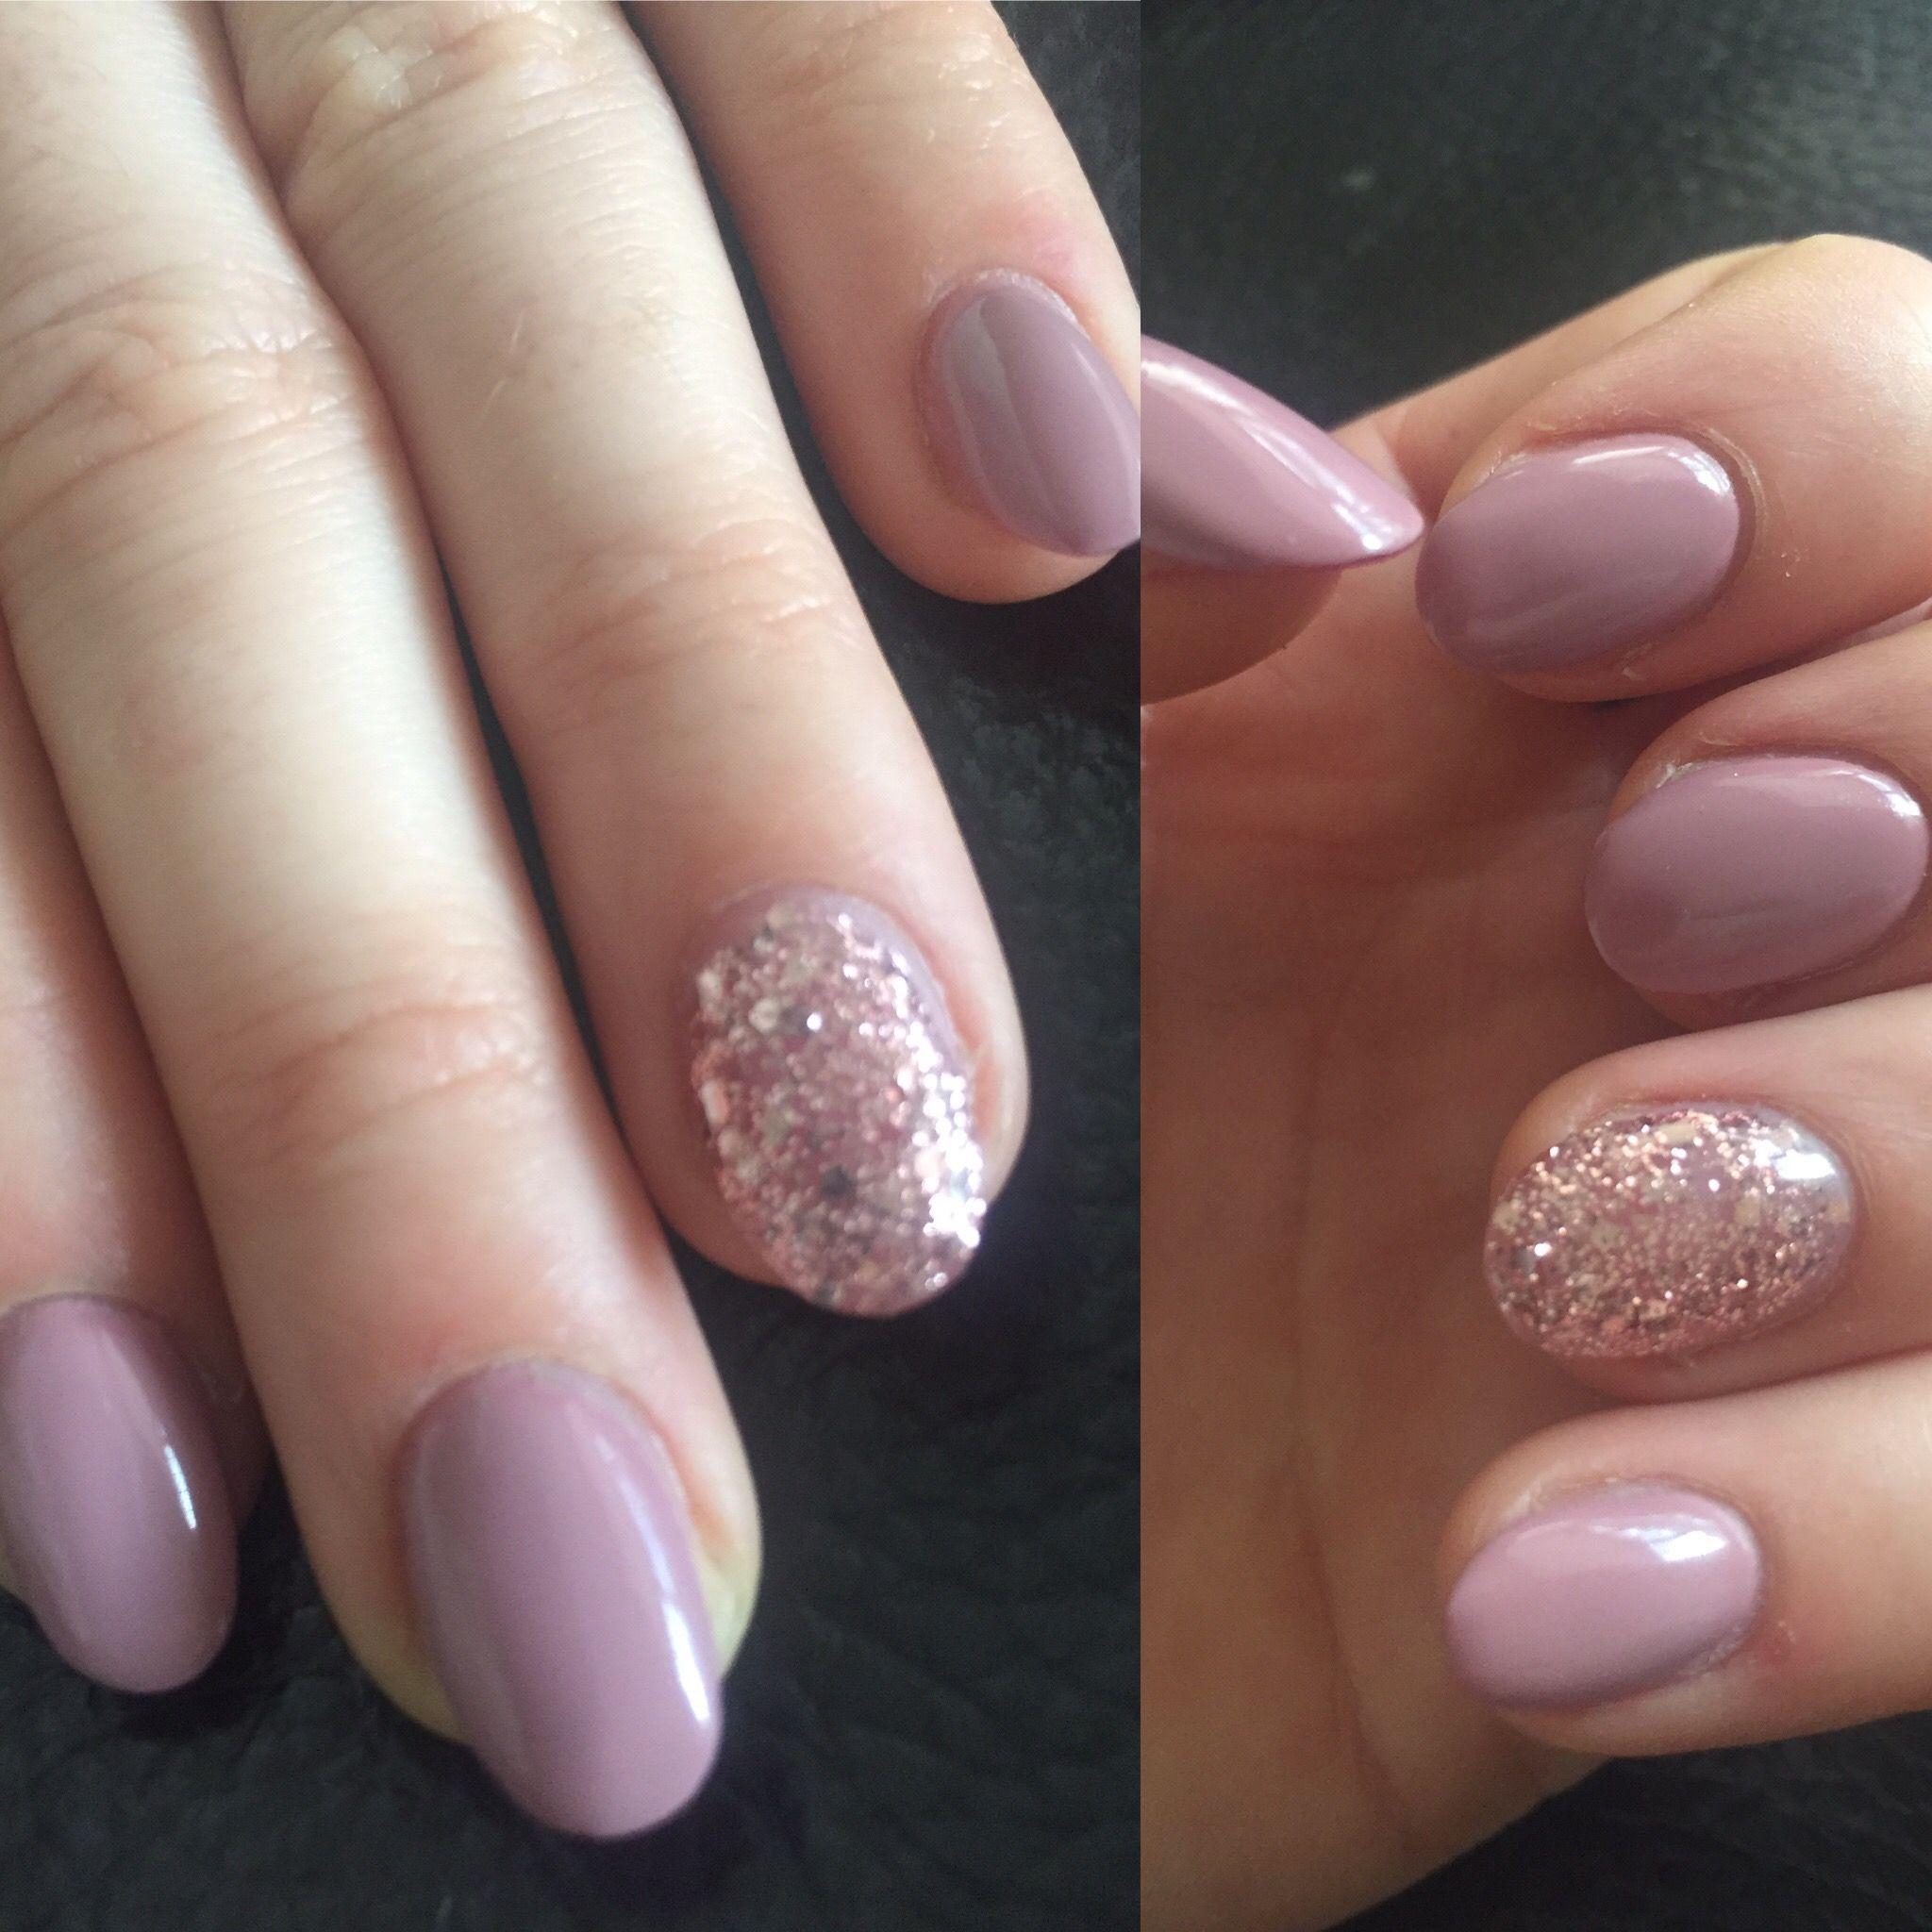 Dusky pink and glitter oval acrylic nails ✨ | Oval nails ...